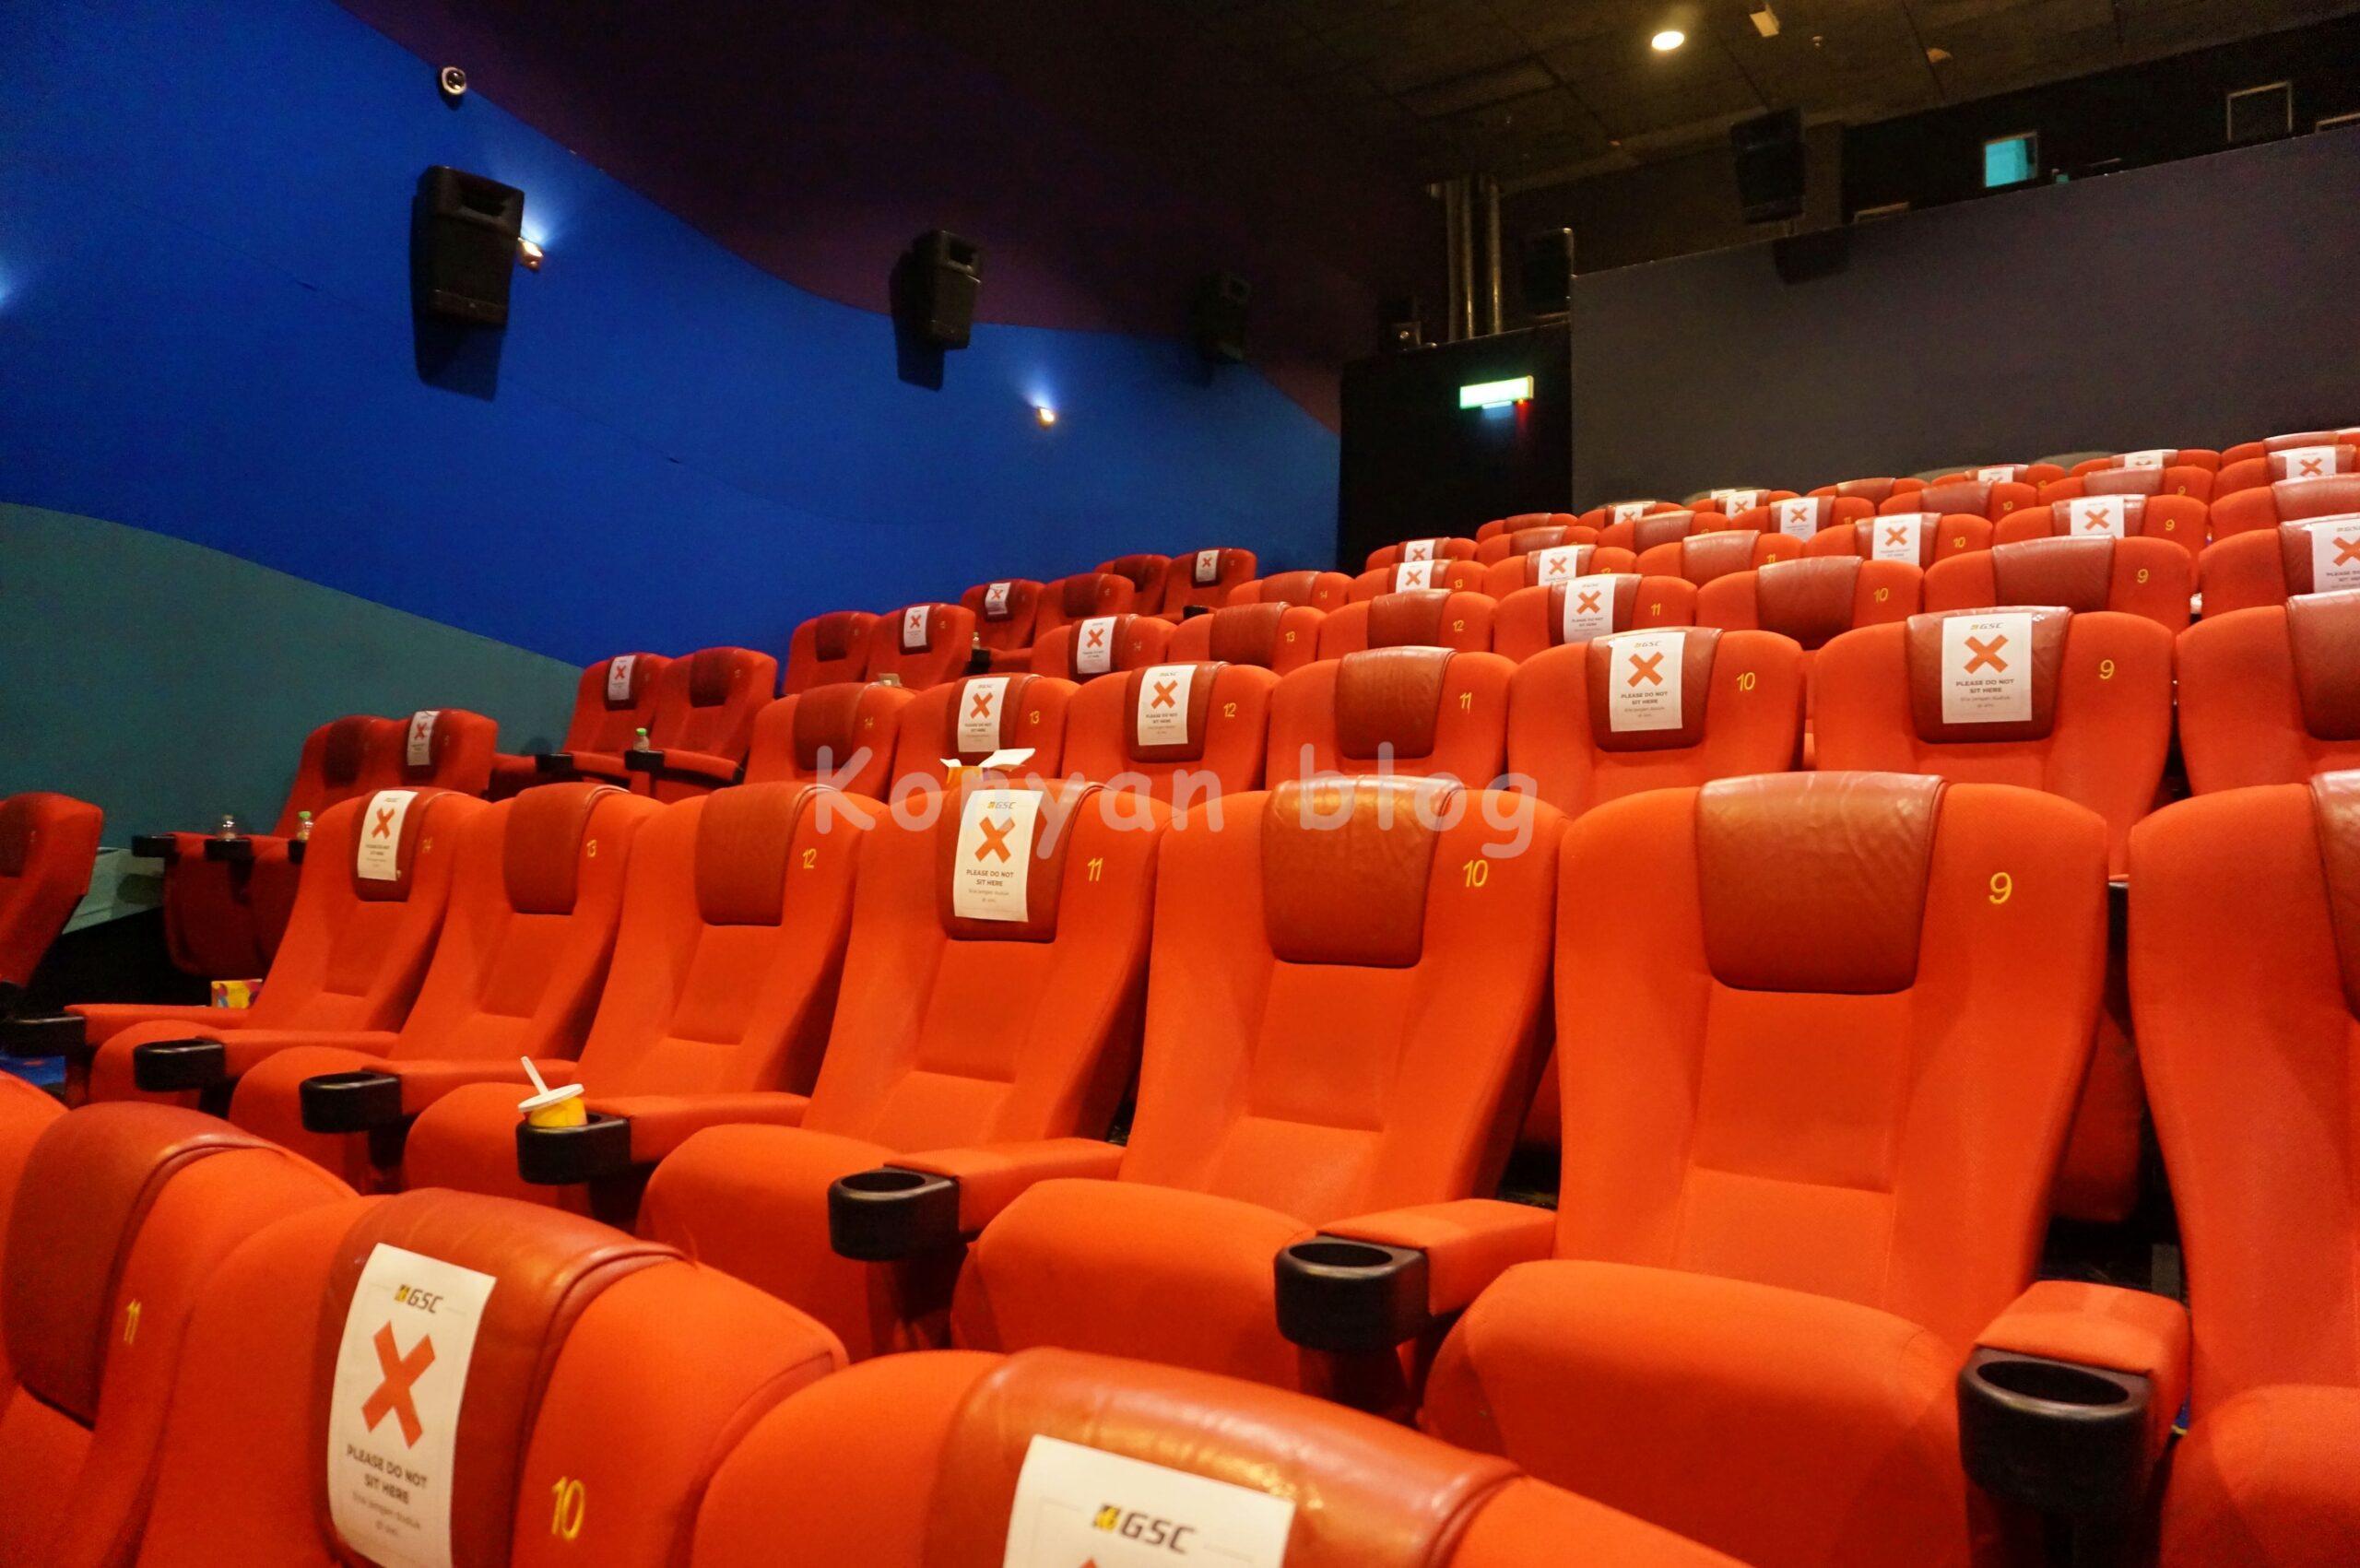 golden screen cinema seat